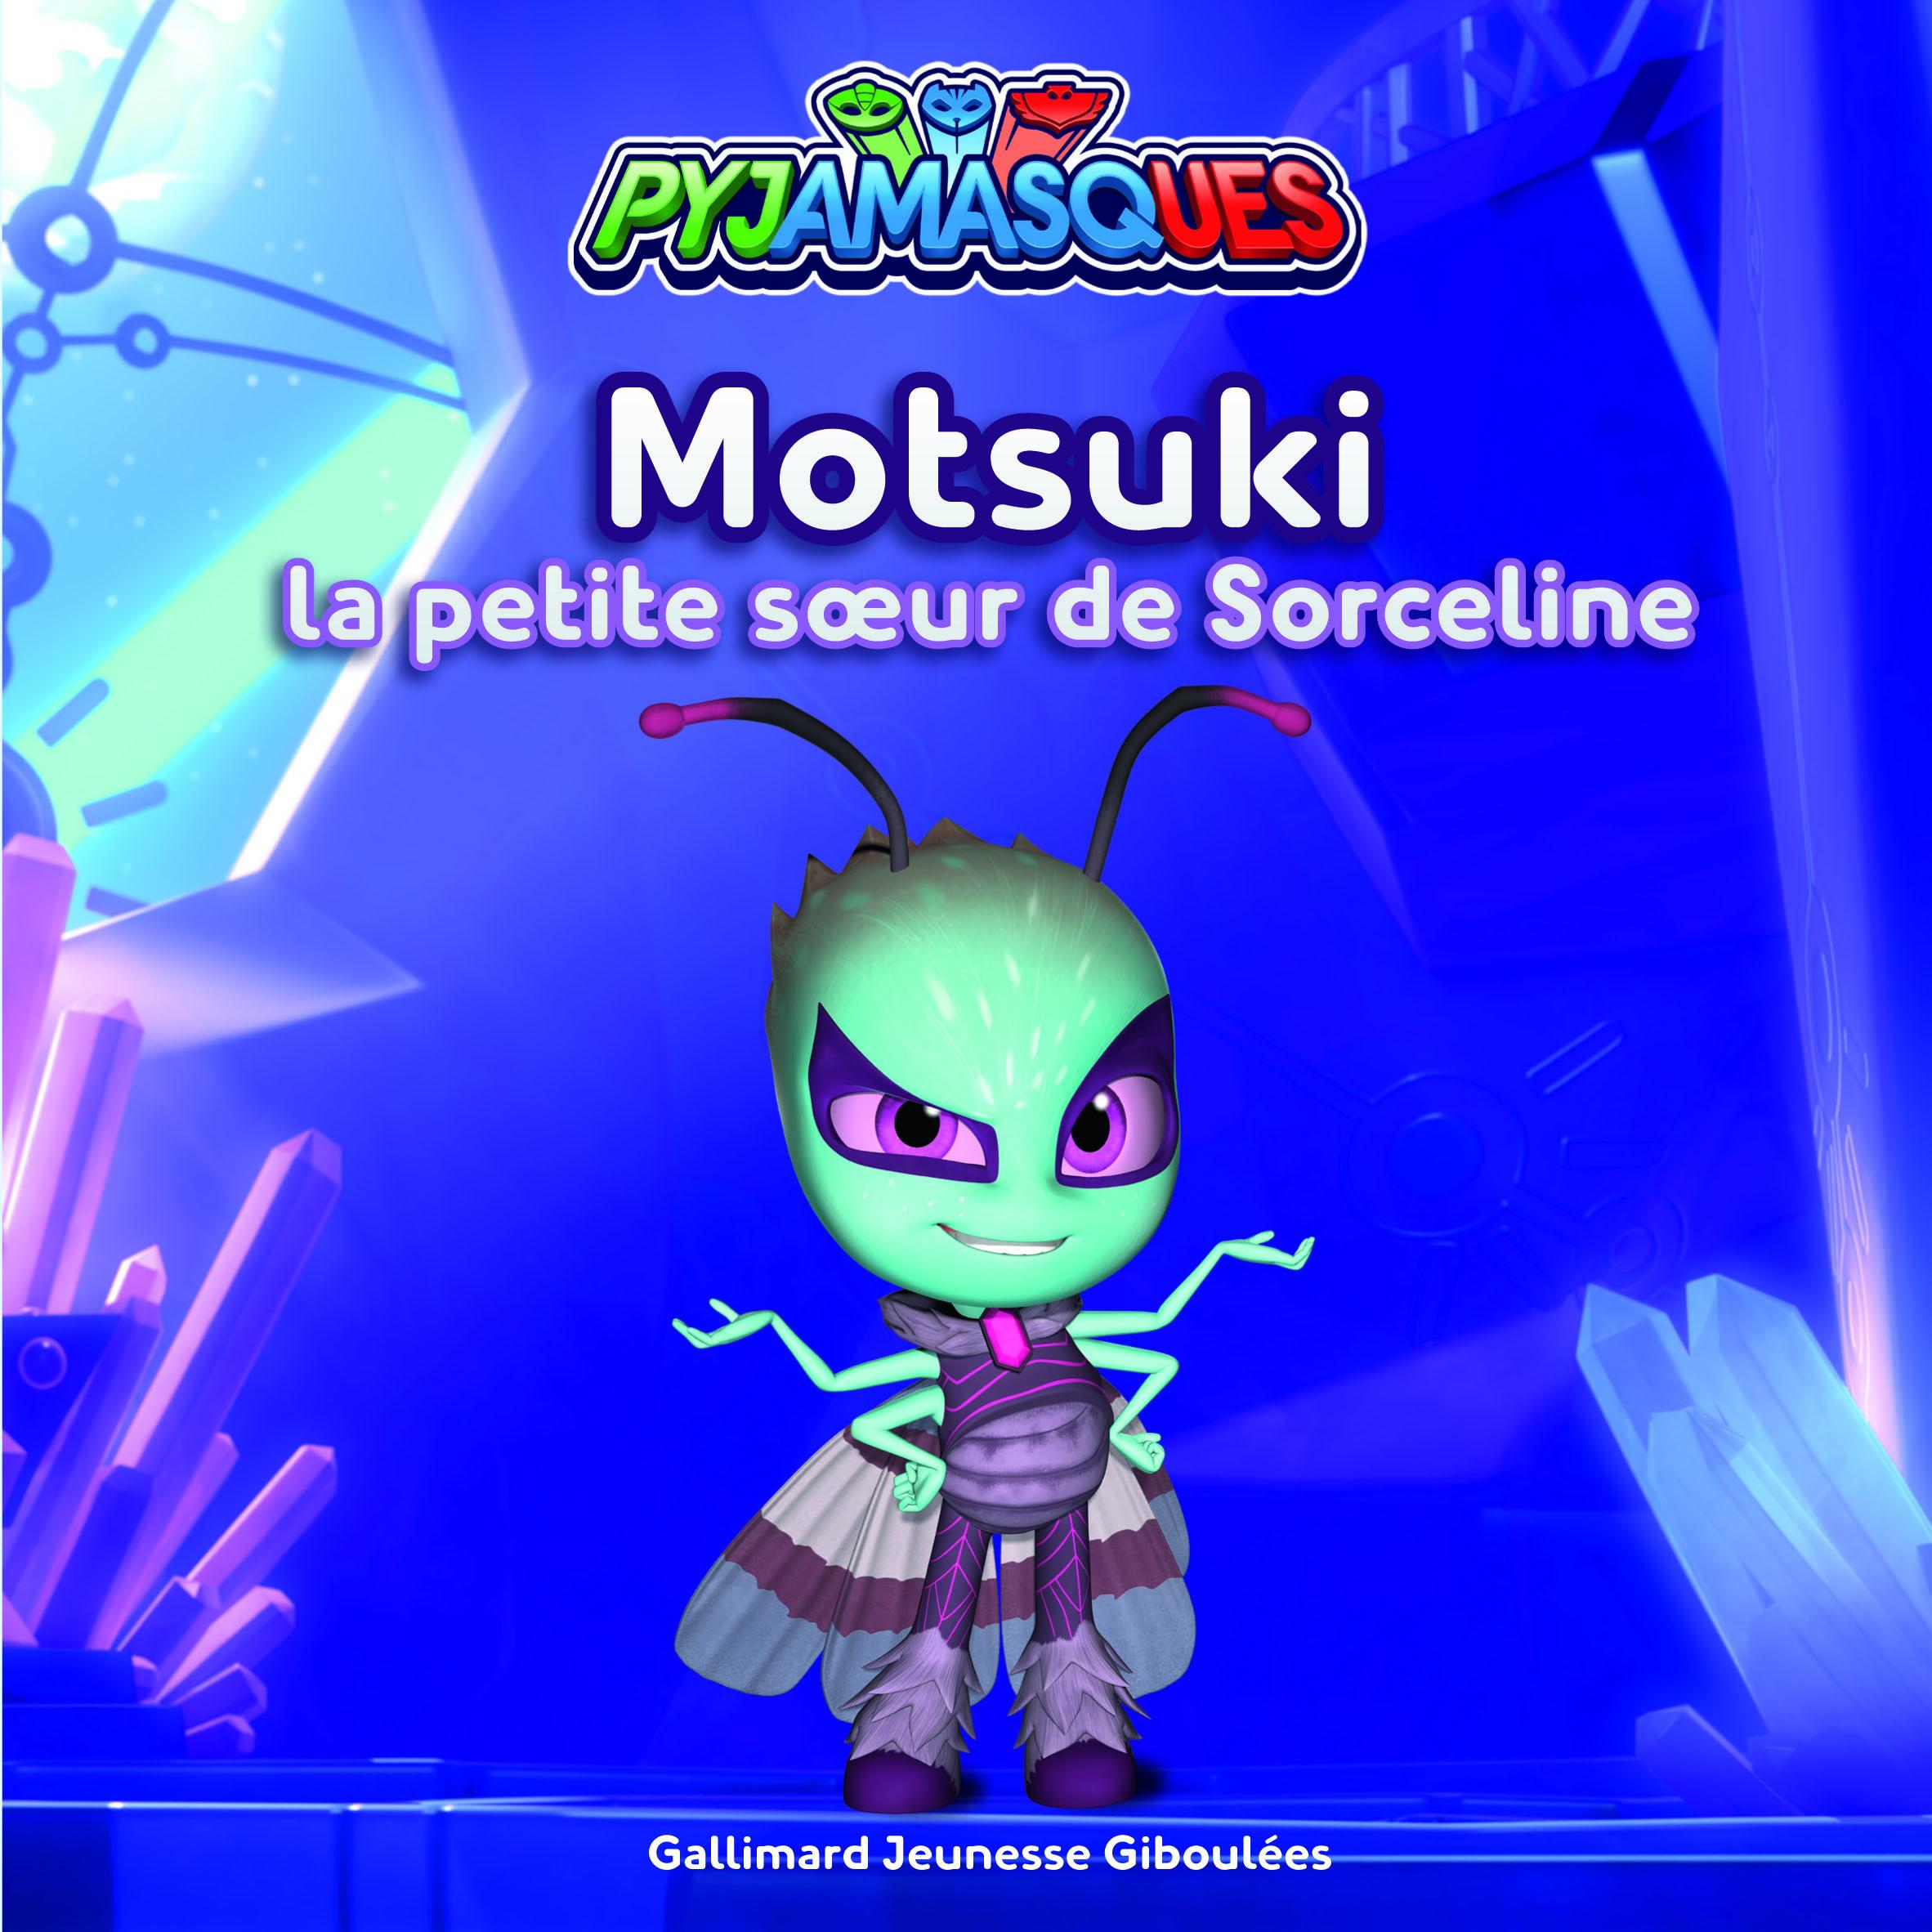 Motsuki, la petite soeur de Sorceline